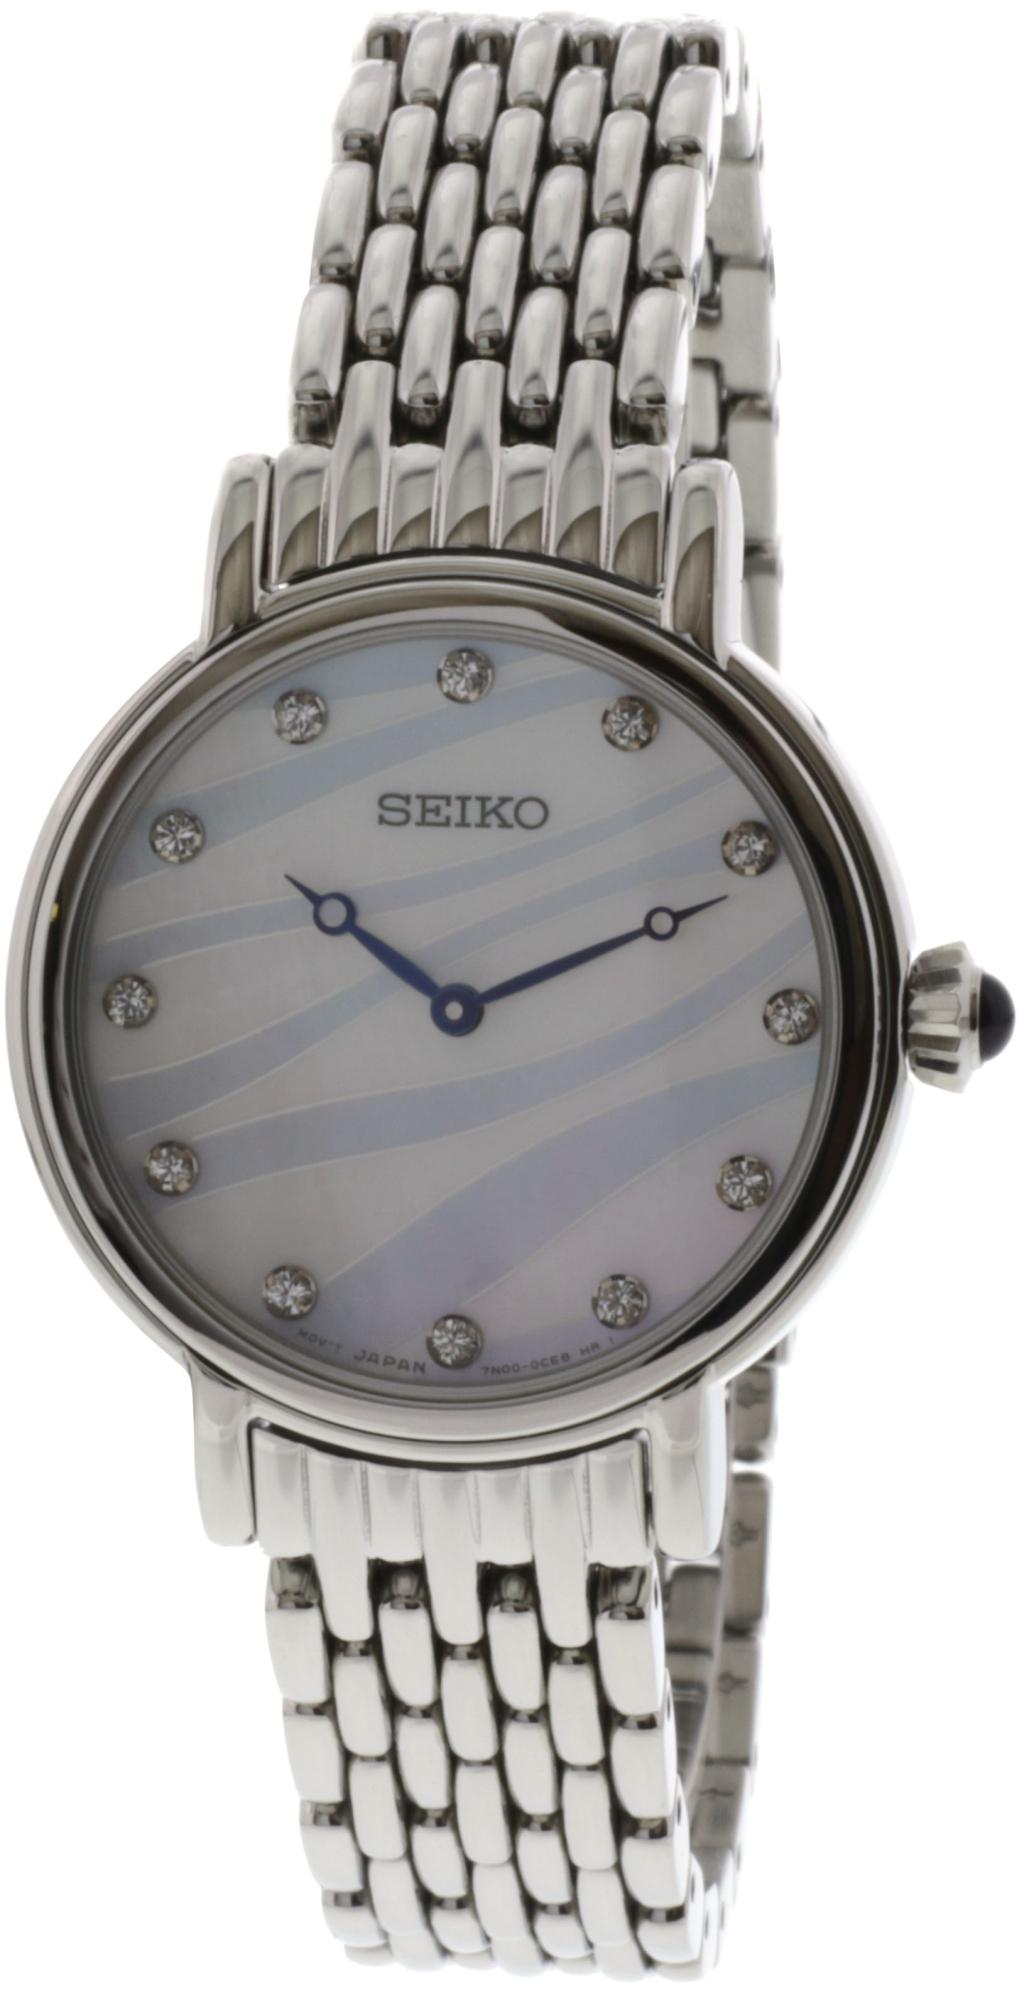 Seiko_Women's_SFQ807_Silver_Stainless-Steel_Japanese_Quartz_Dress_Watch